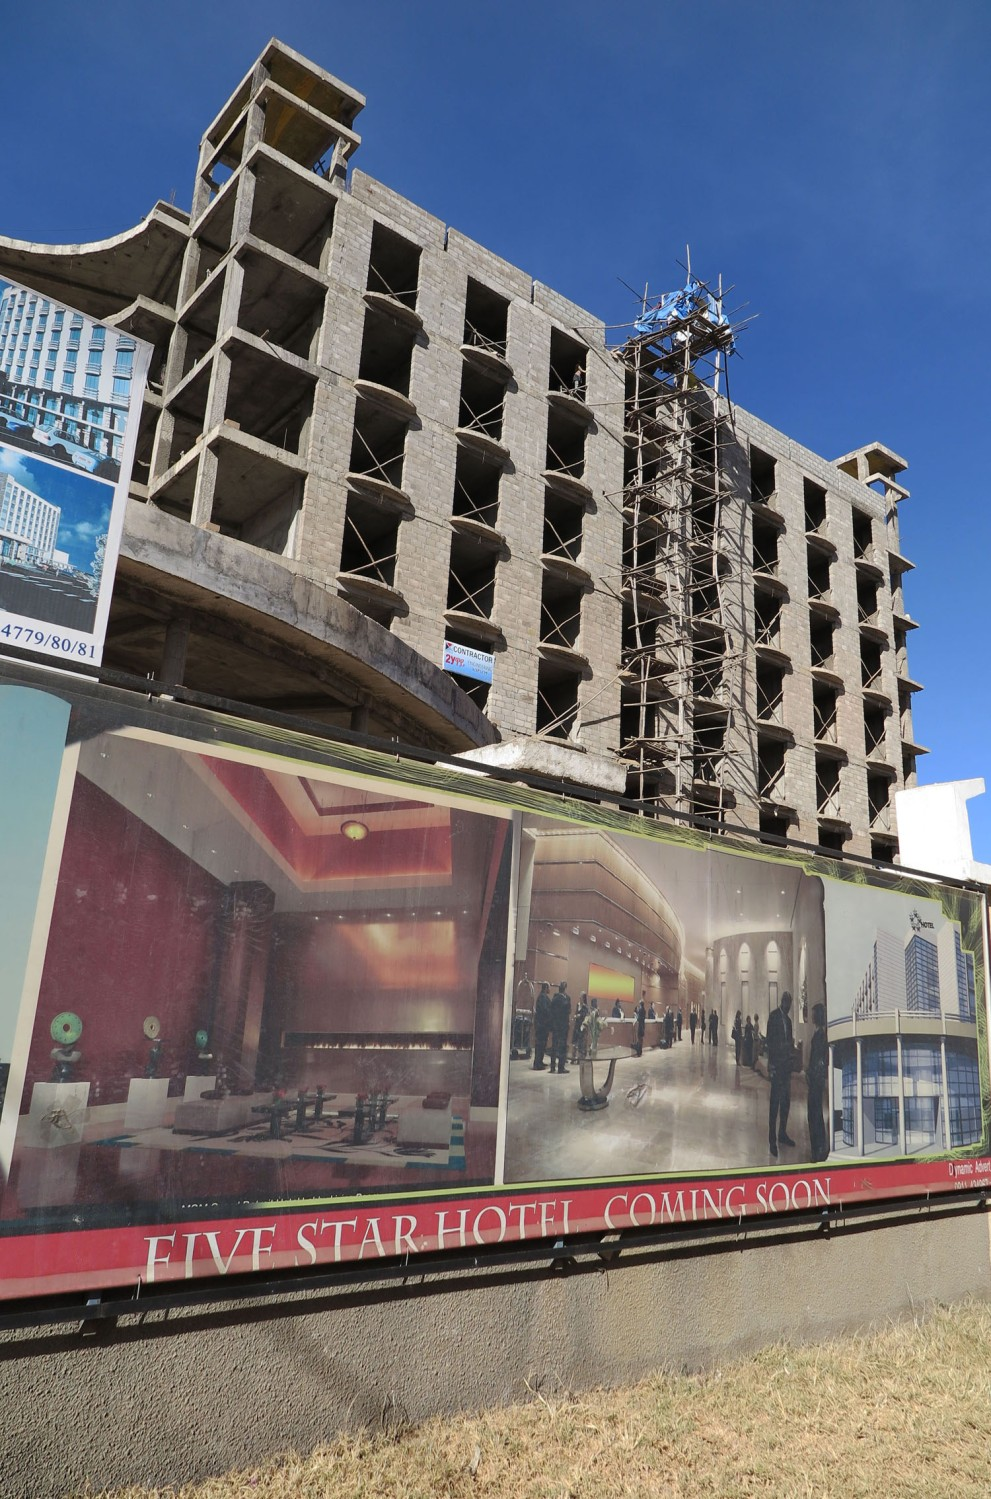 Ethiopia-Harar-Street-Scenes-Five-Star-Hotel